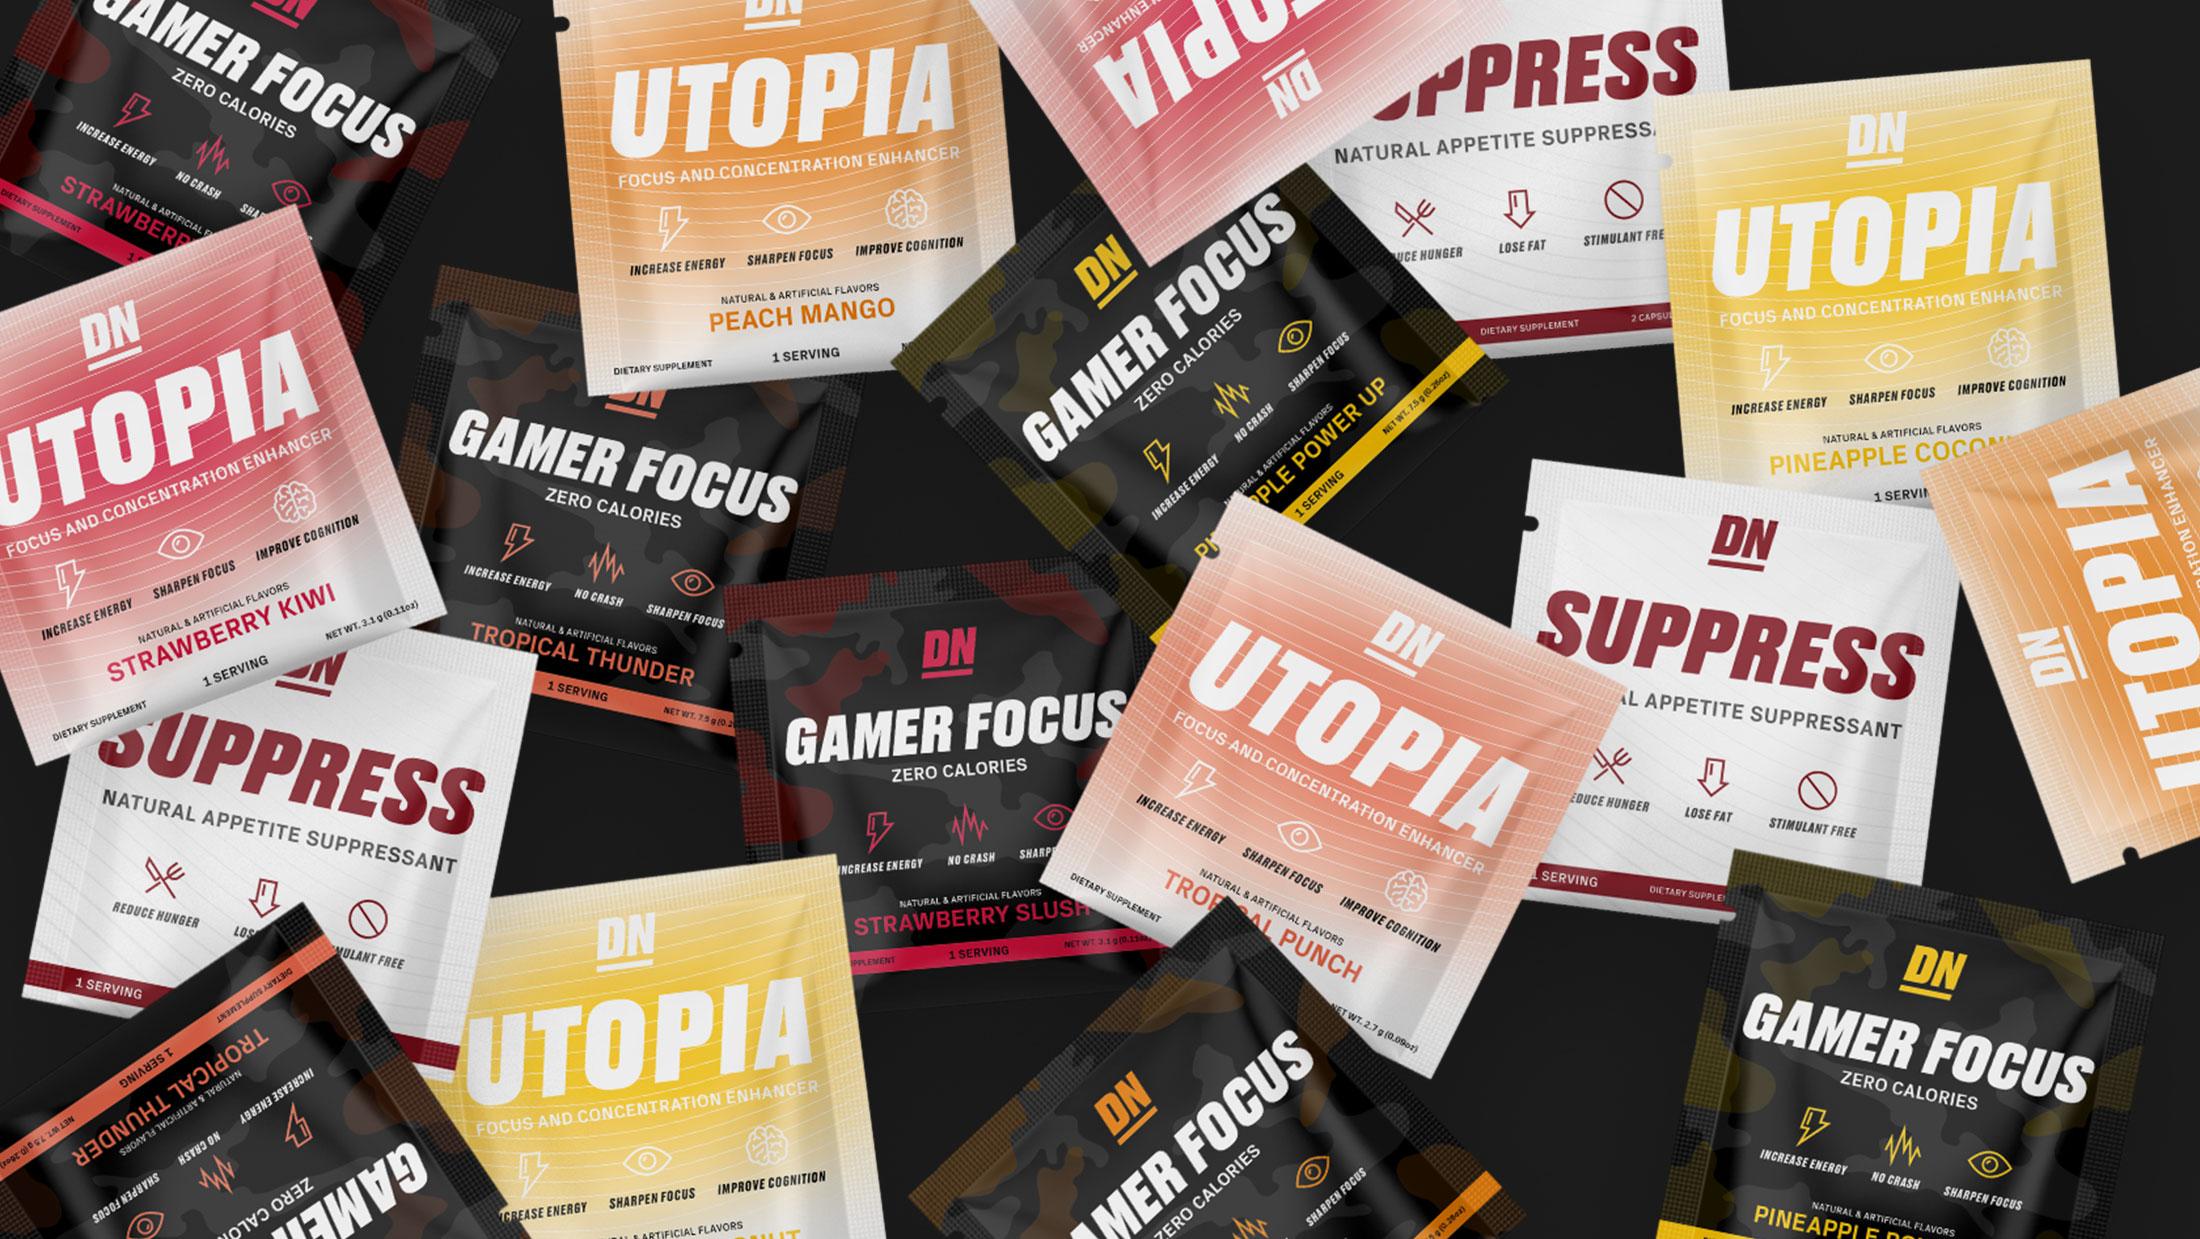 A variety of De Novo supplement sachet packets randomly scattered